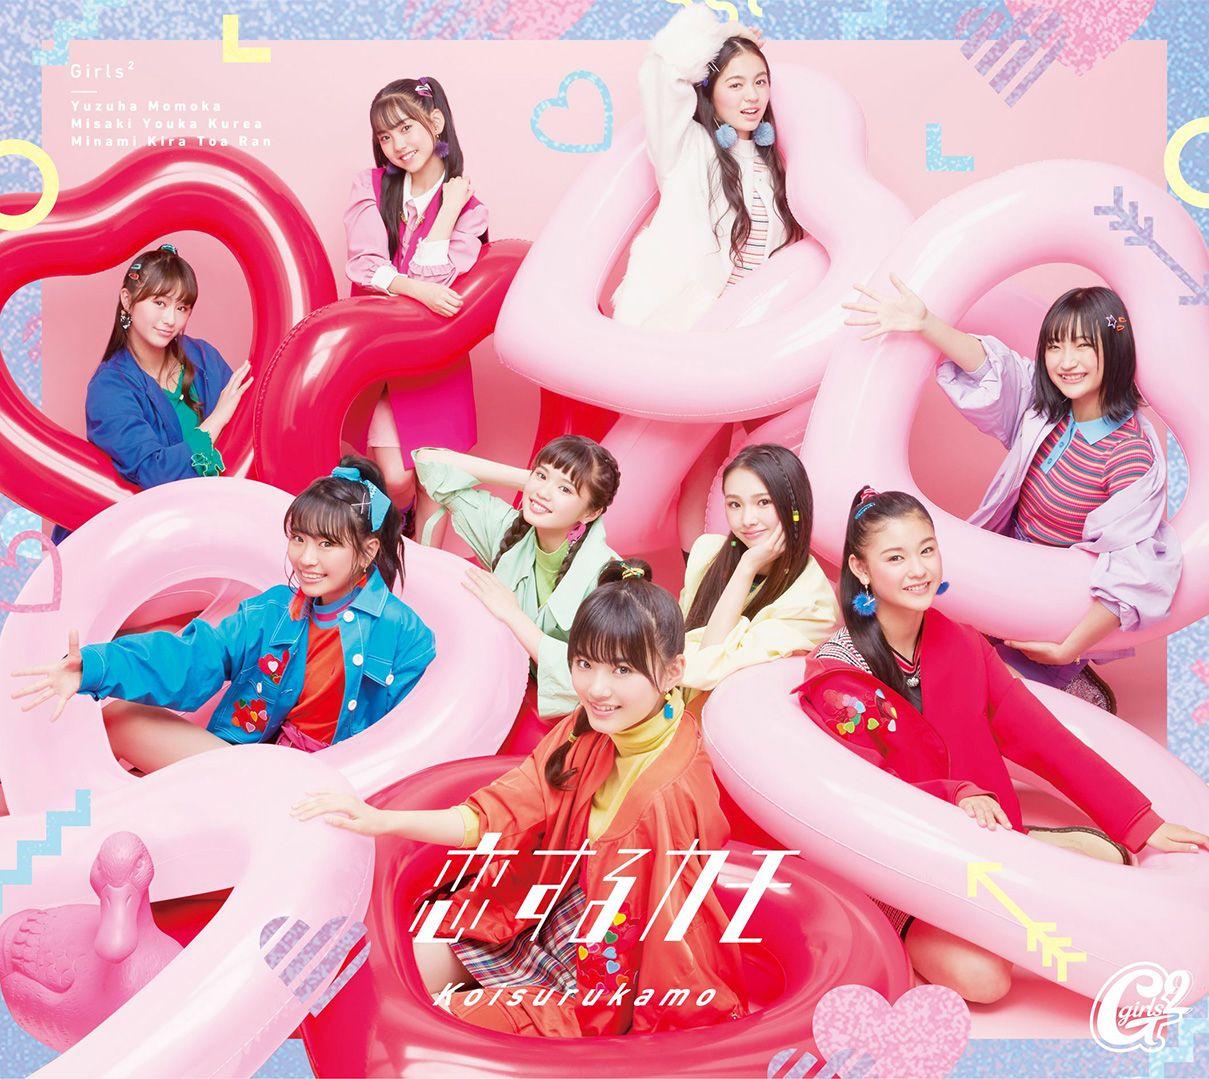 Girls2 恋するカモ (初回限定盤 CD+DVD)